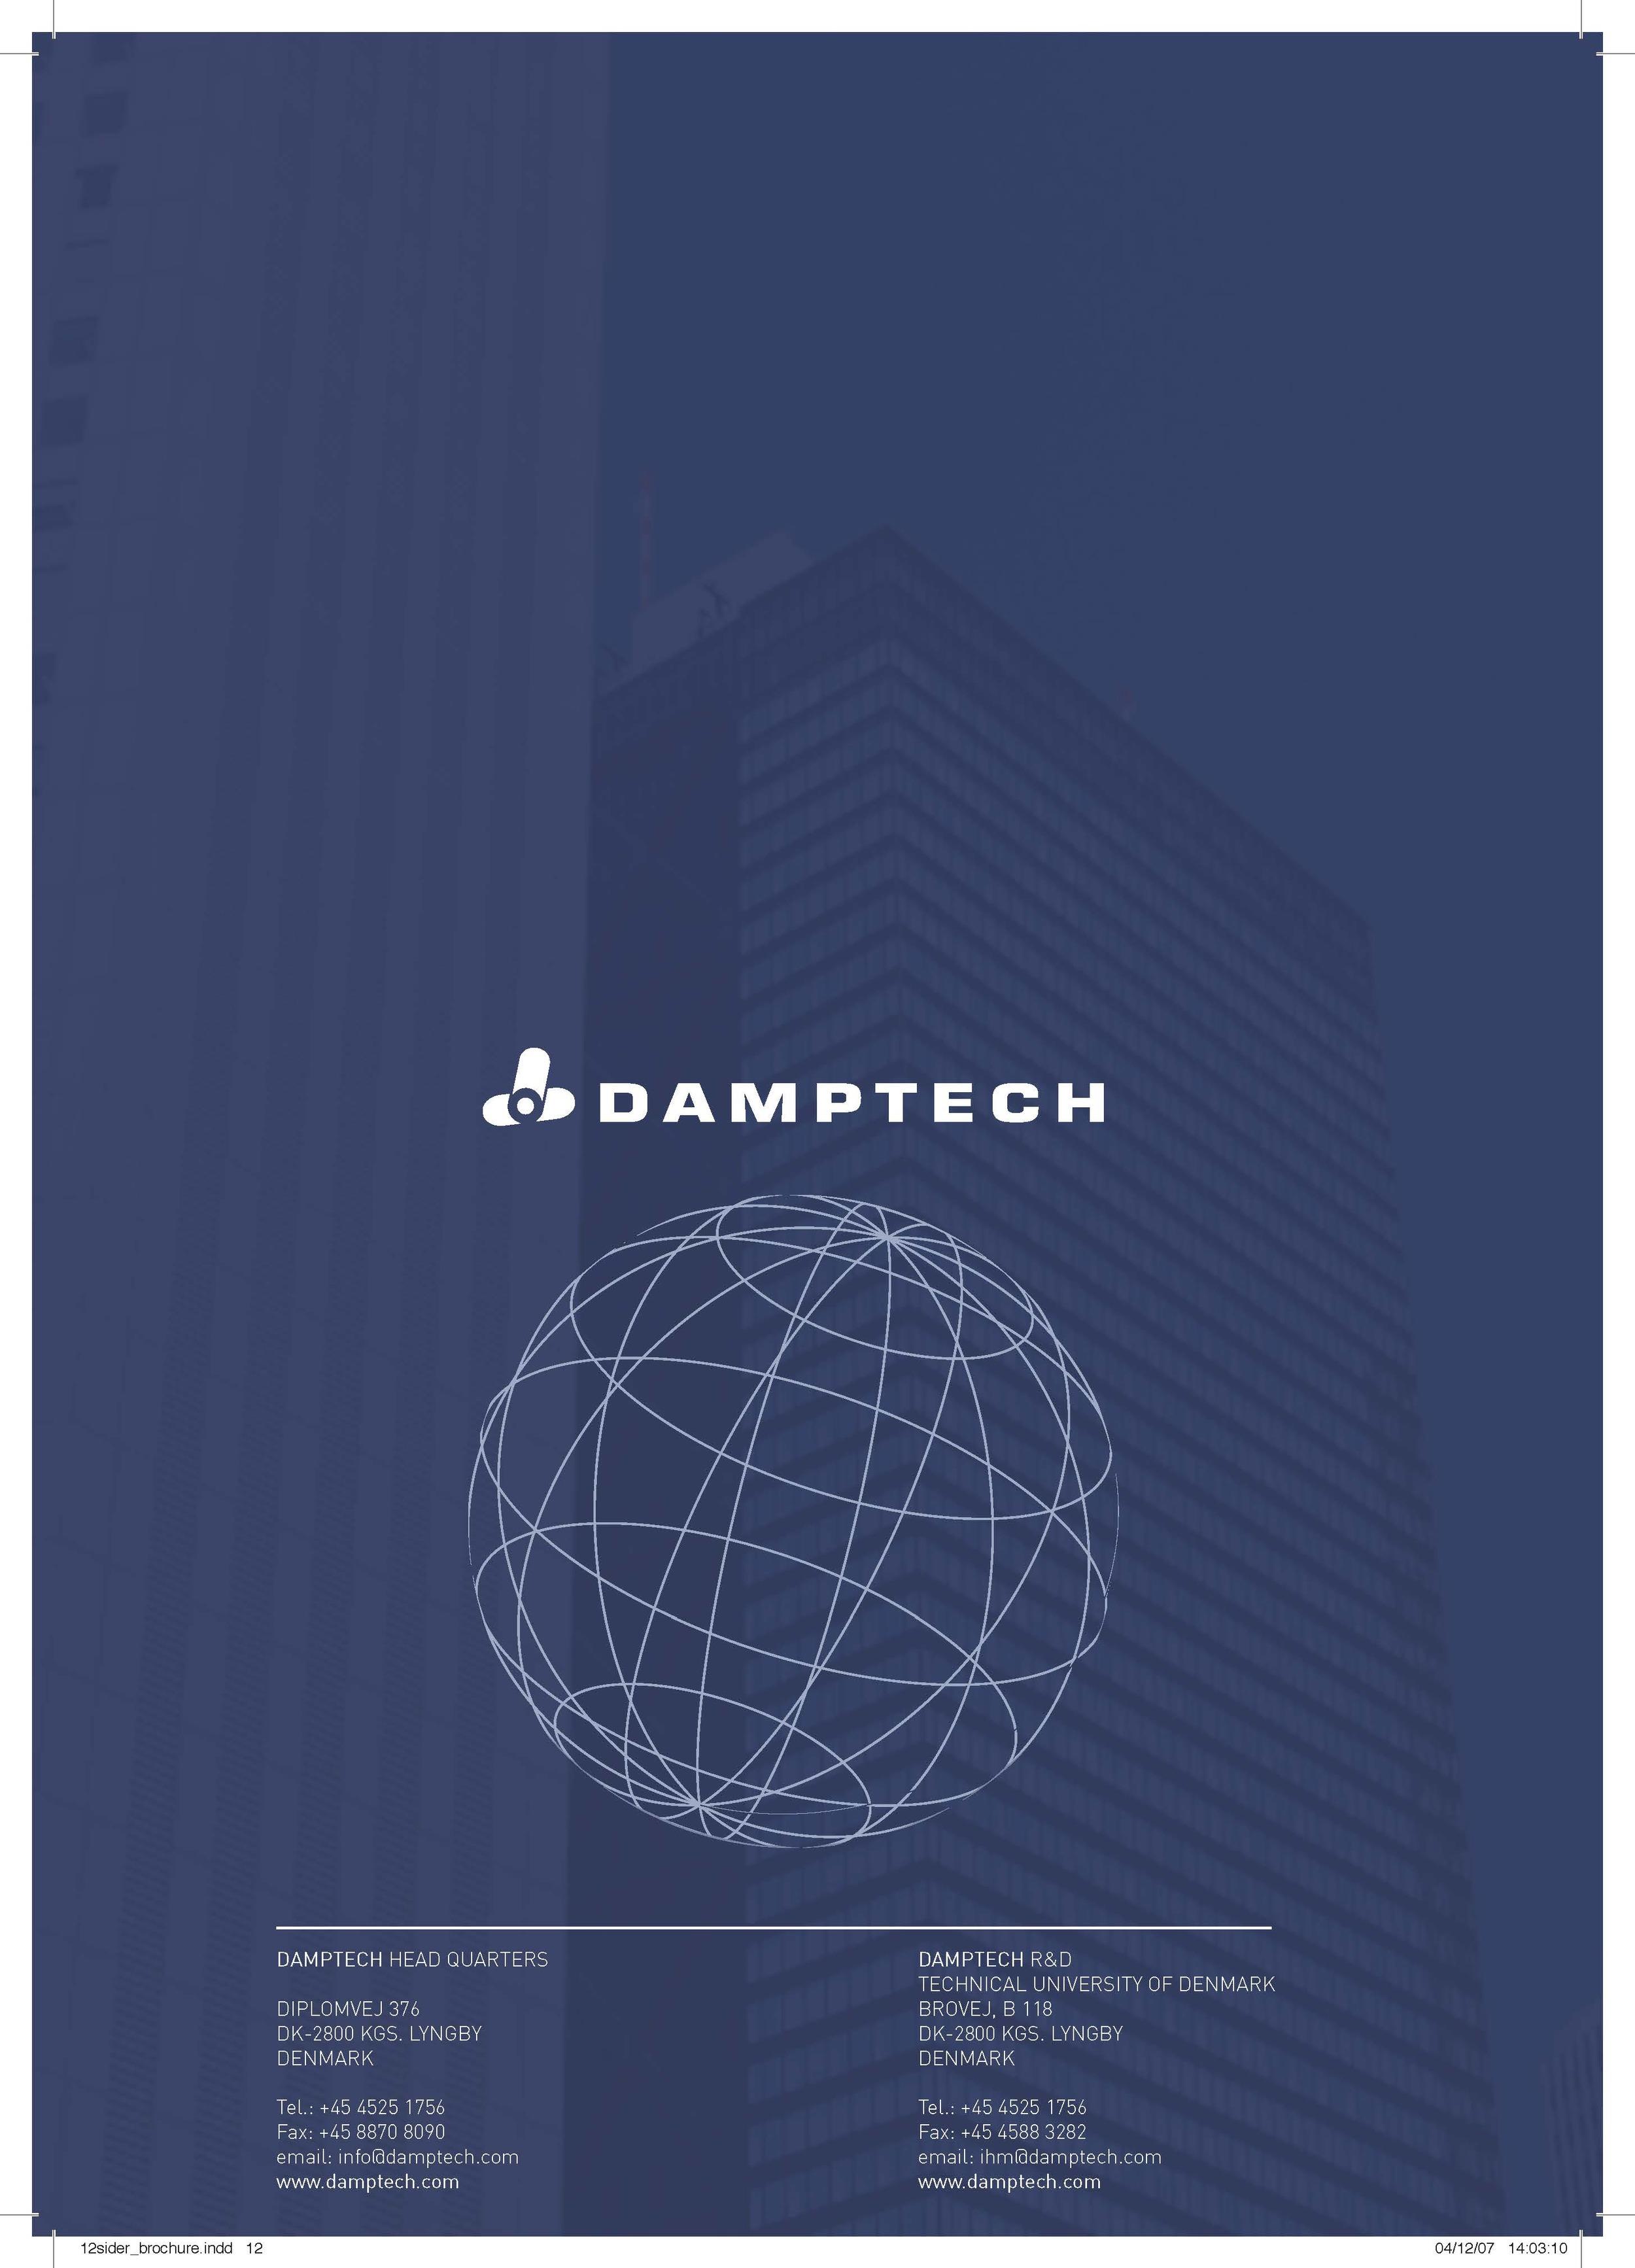 damptech_brochure_Page_12.jpg